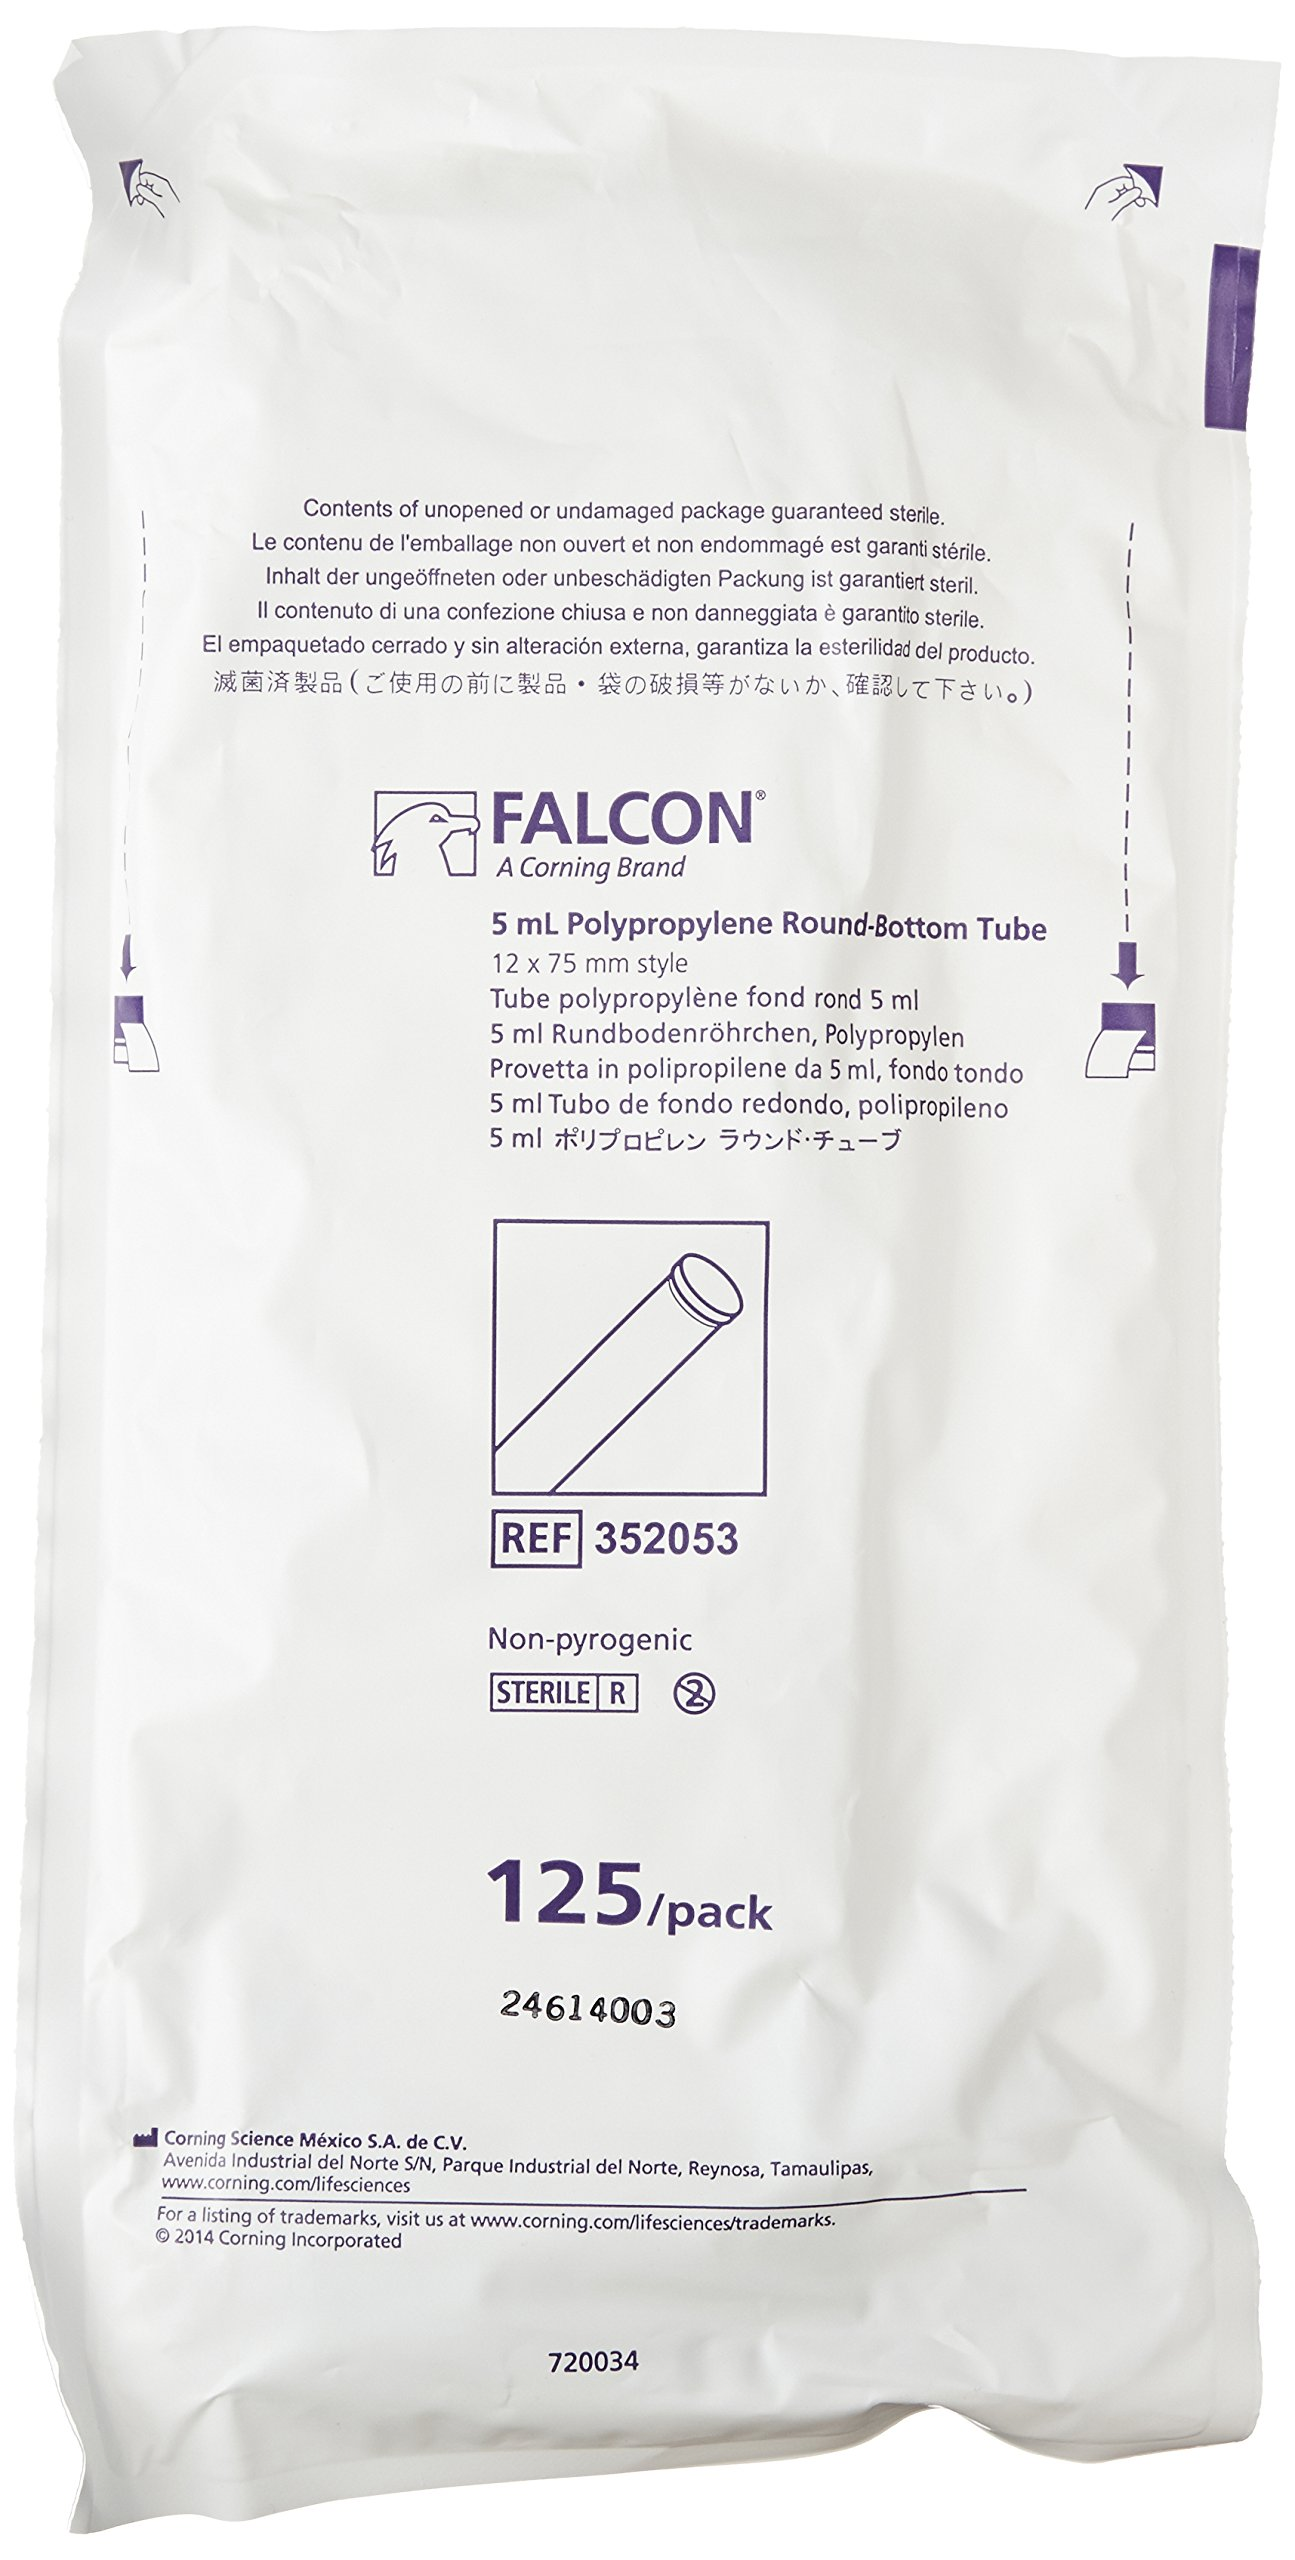 BD 352053 Falcon Polypropylene Round Bottom Centrifuge Test Tube, 12mm Diameter x 75mm Length, 5mL Capacity, 3000 RCF (Case of 1000)